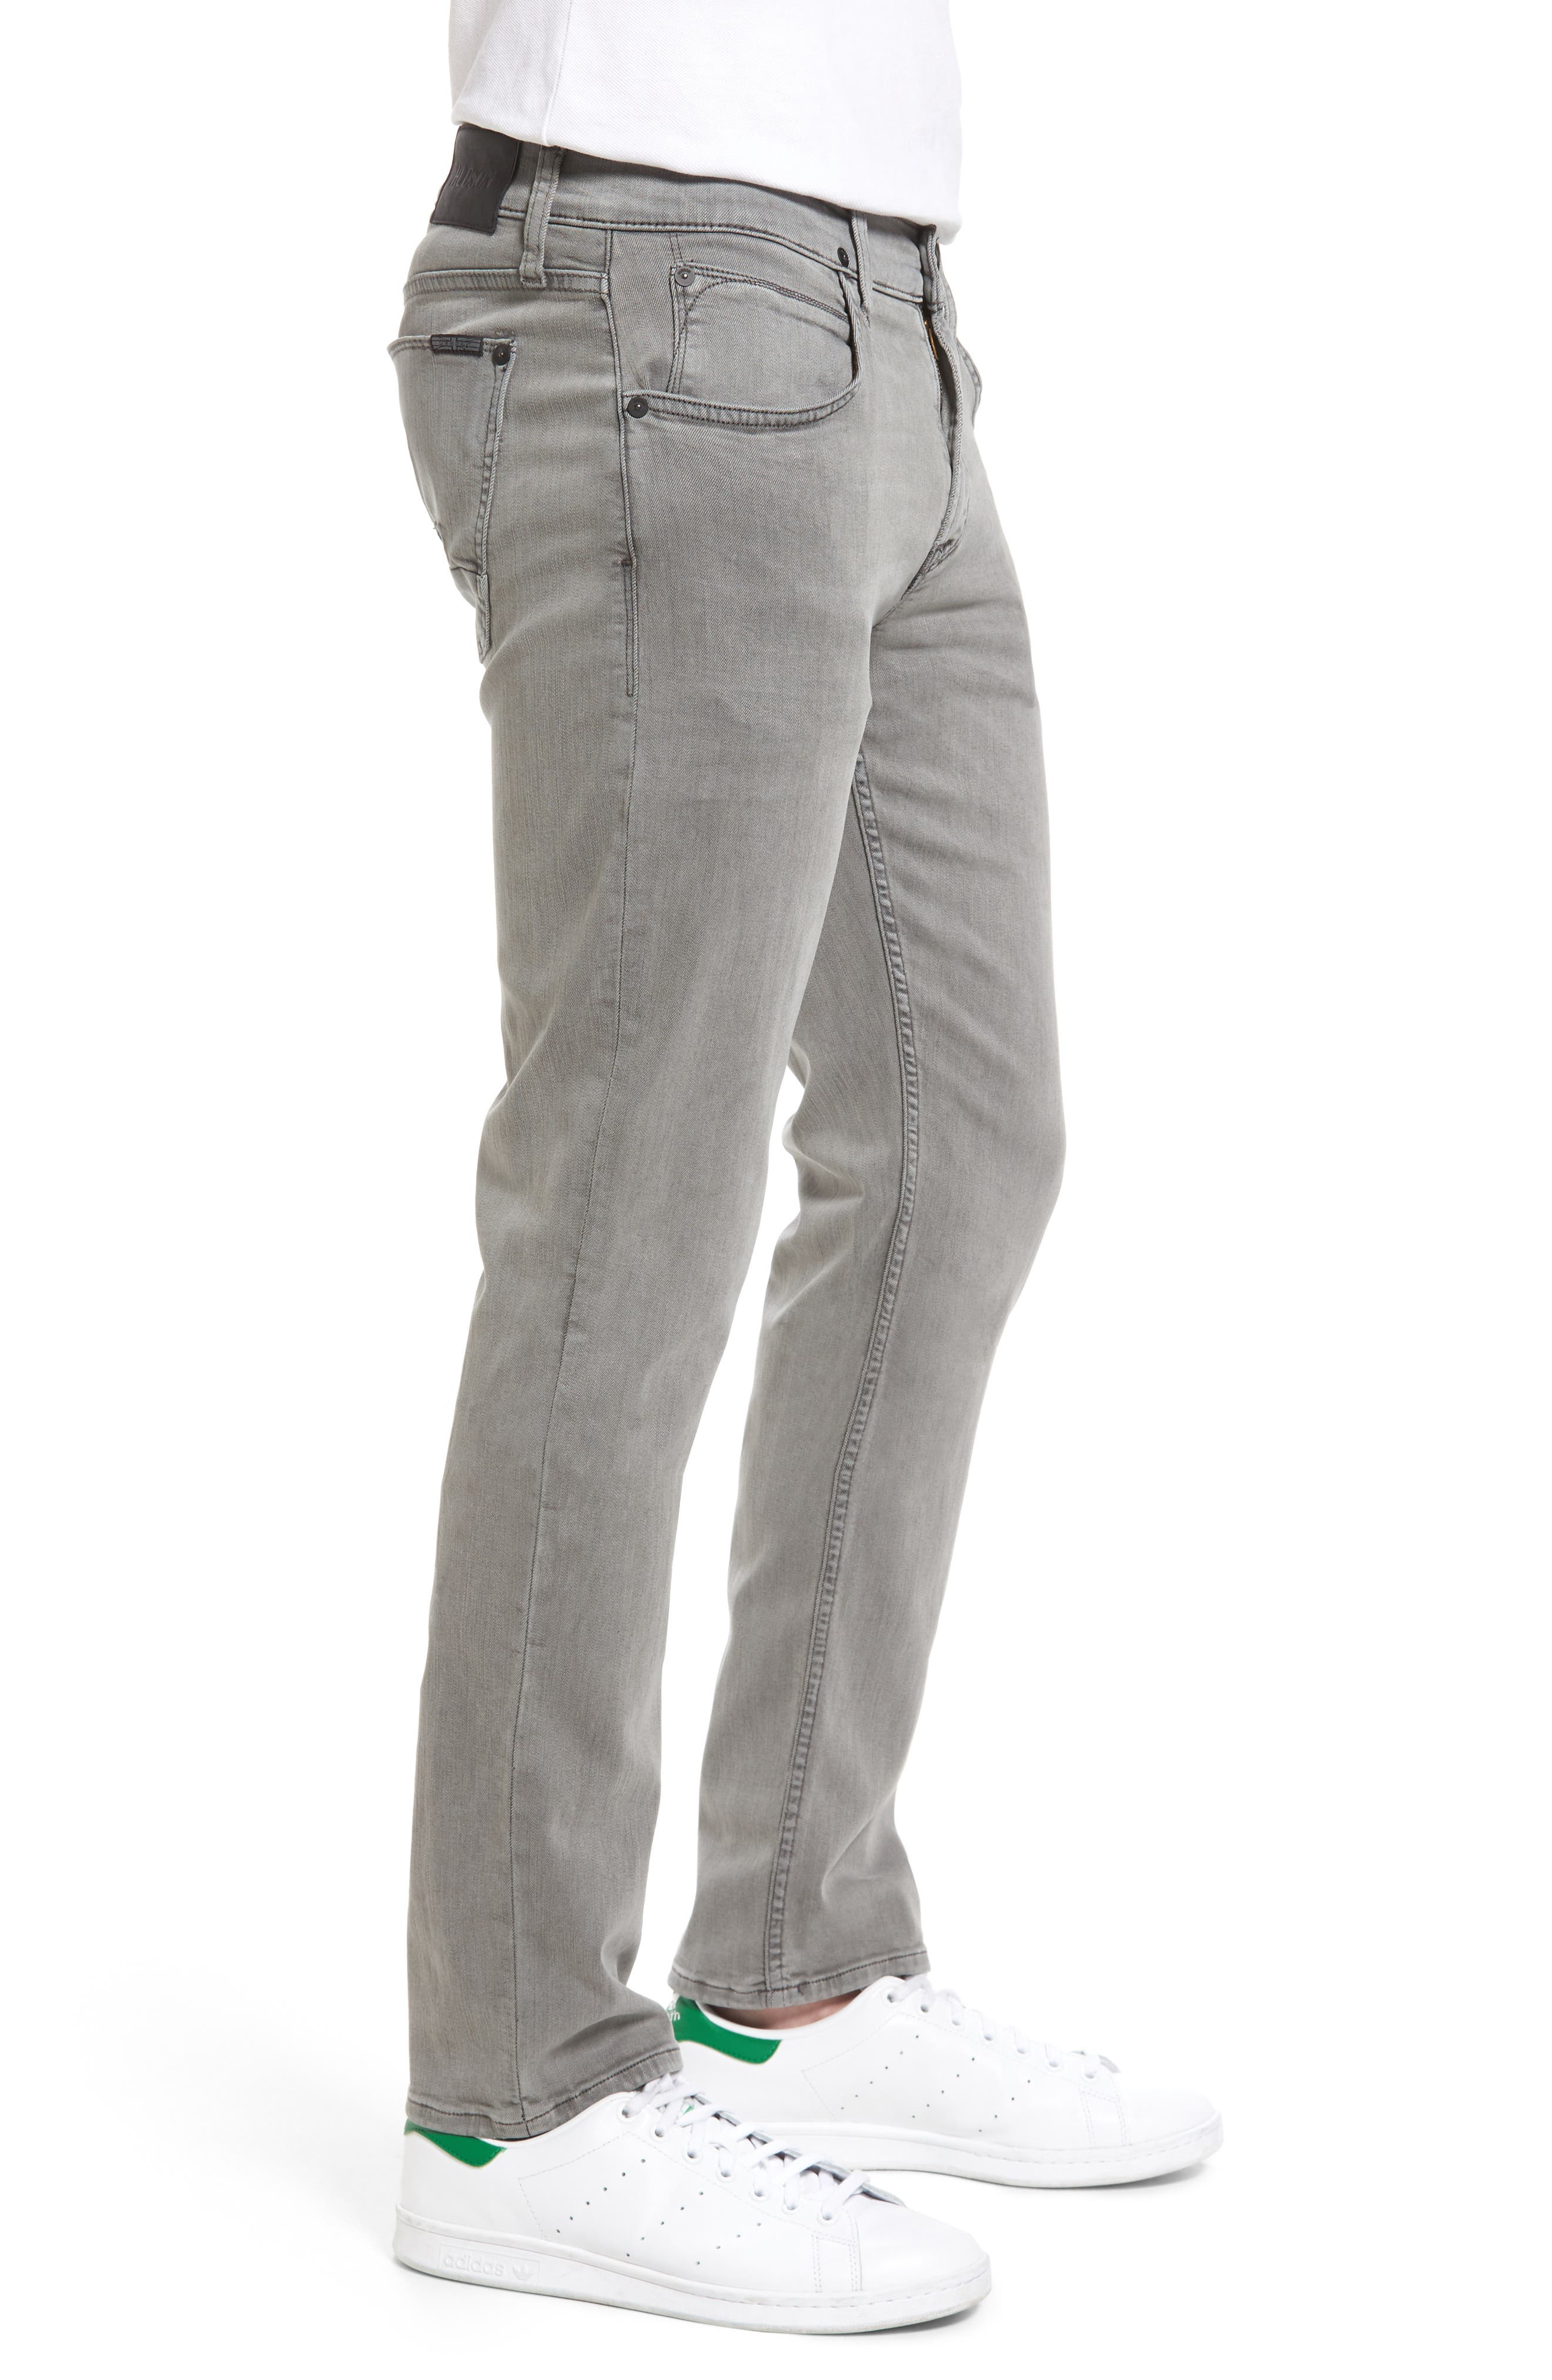 Blake Slim Fit Jeans,                             Alternate thumbnail 3, color,                             Barriers